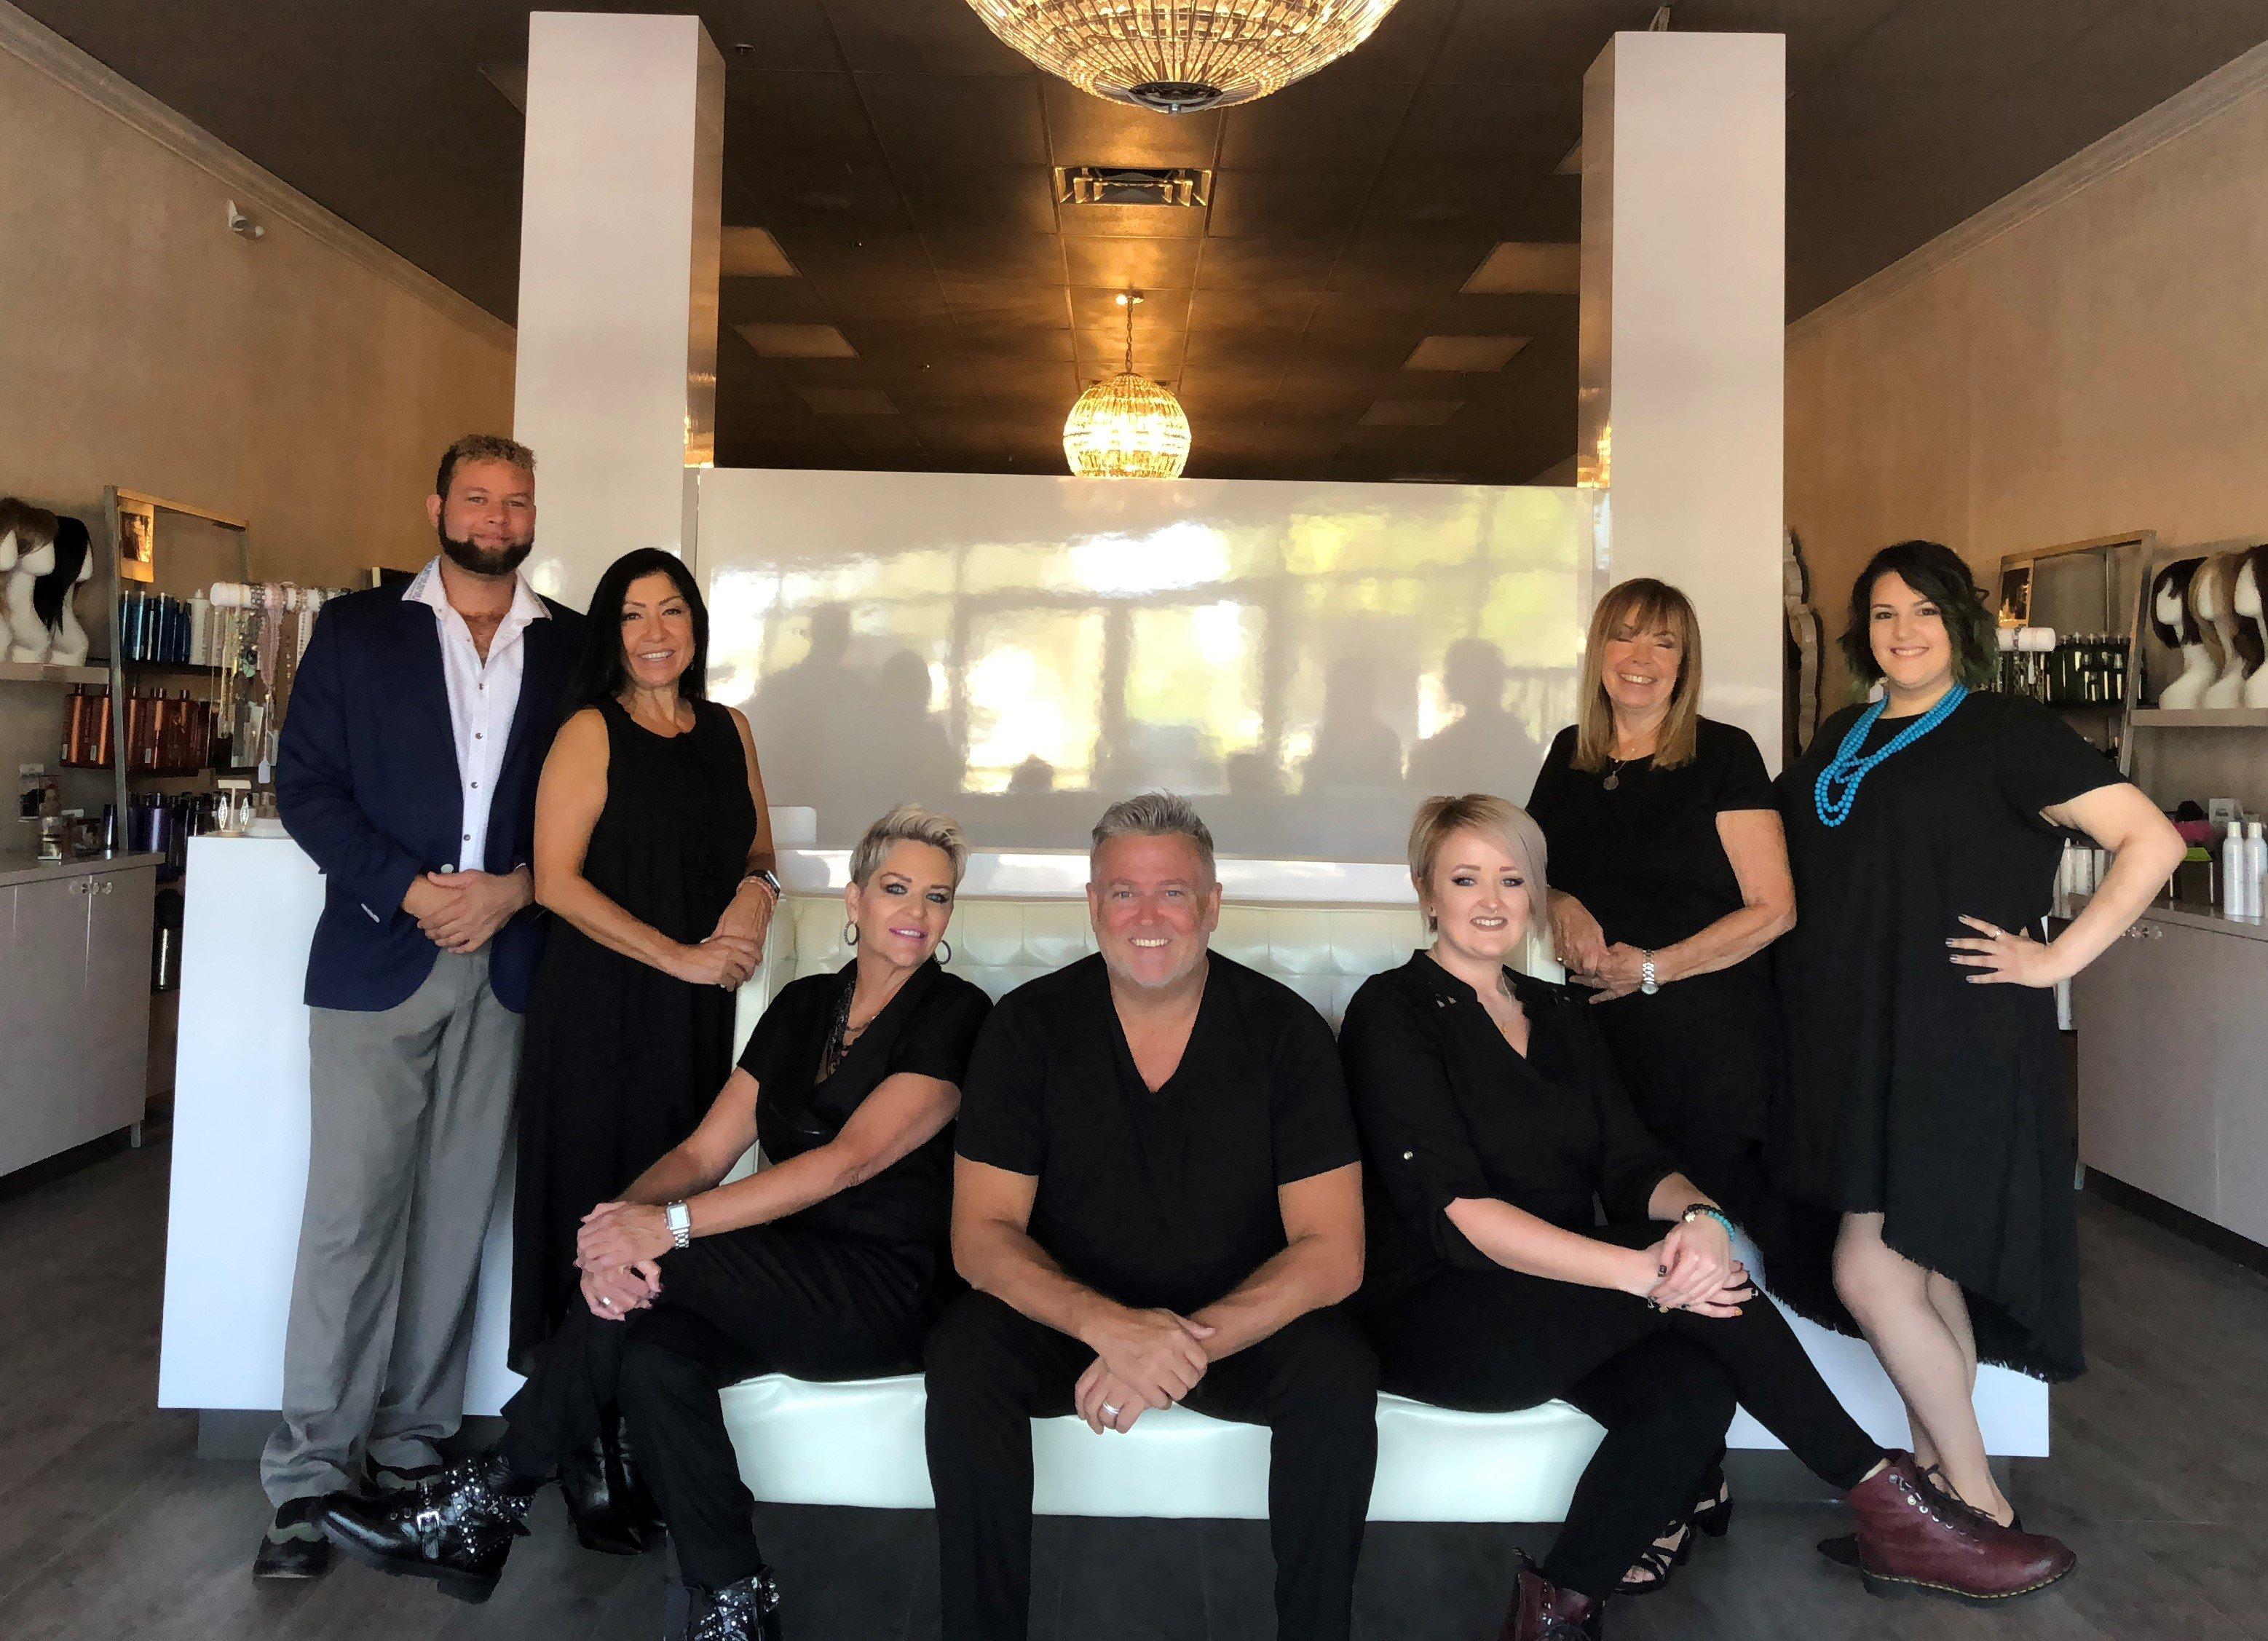 Hurricane-Ravaged Salon Wins Modern Salon Makeover Contest By Minerva Beauty